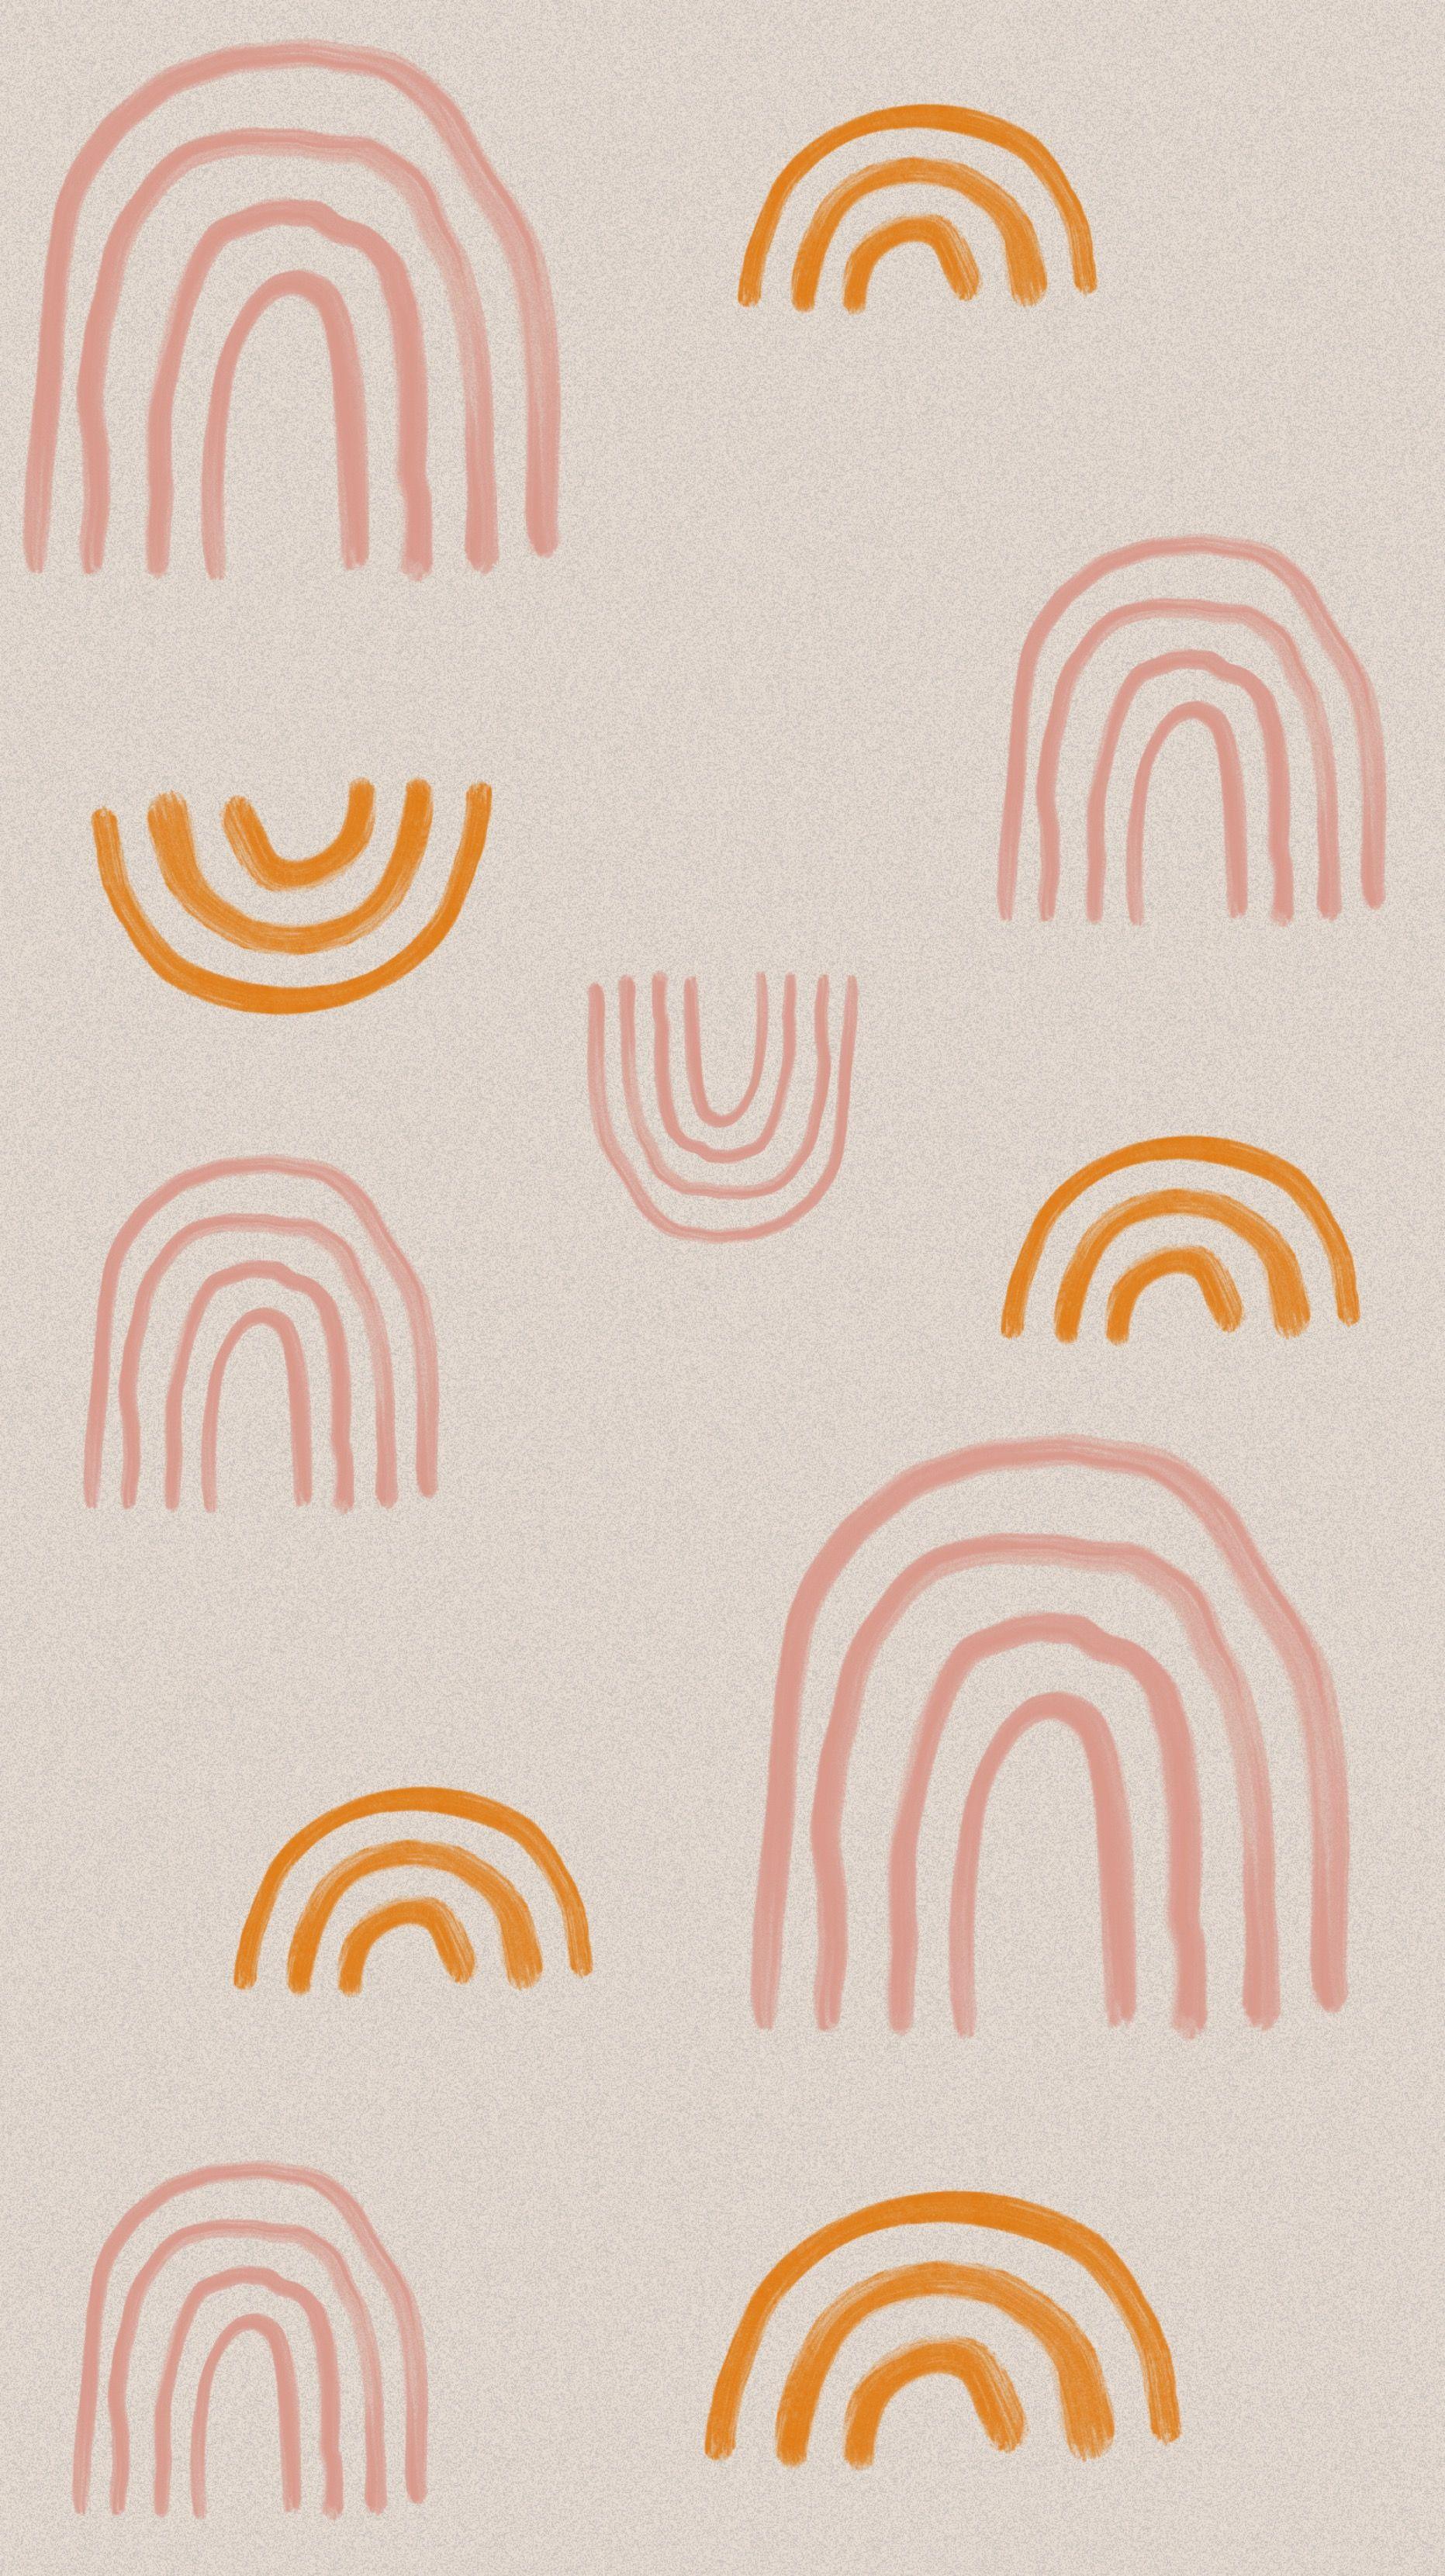 Rainbow Wallpapers Phone Wallpaper Boho Wallpaper Iphone Boho Boho Wallpaper